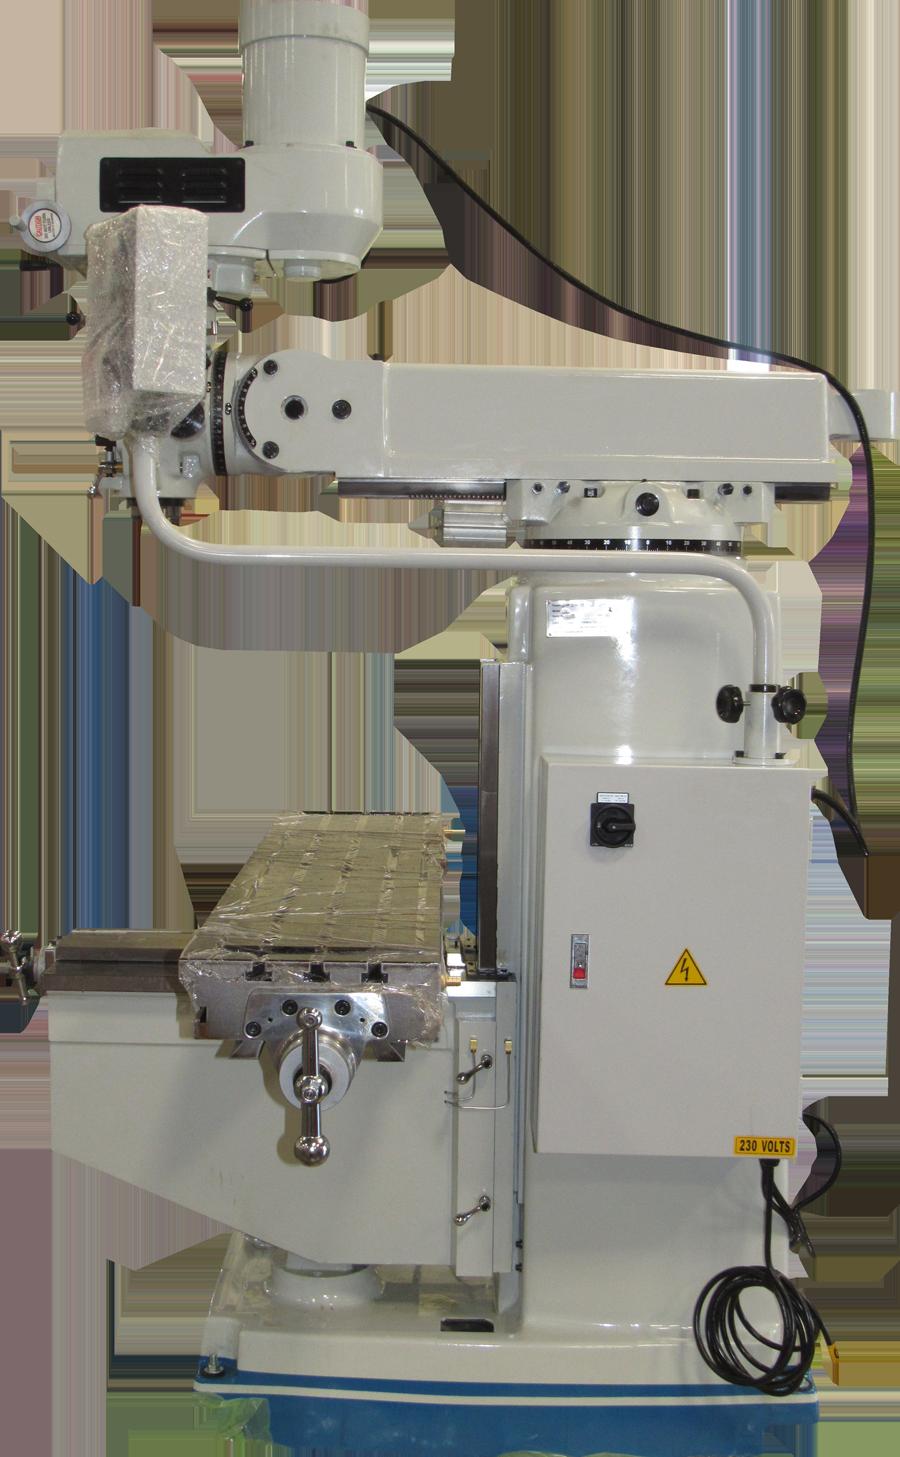 ACRA MODEL 5V VARIABLE SPEED VERTICAL MILLING MACHINE